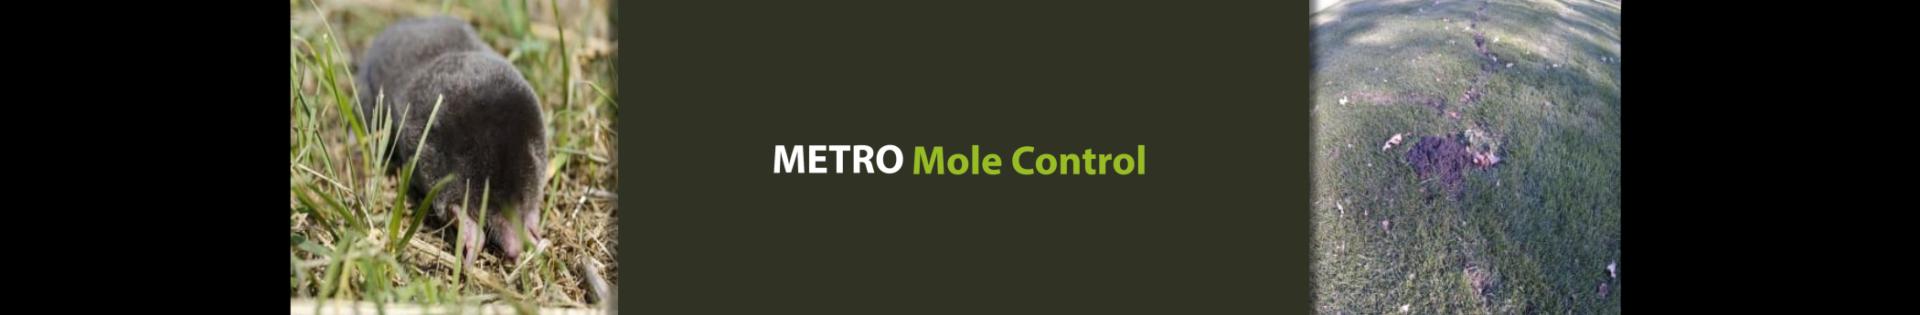 Metro Mole Control